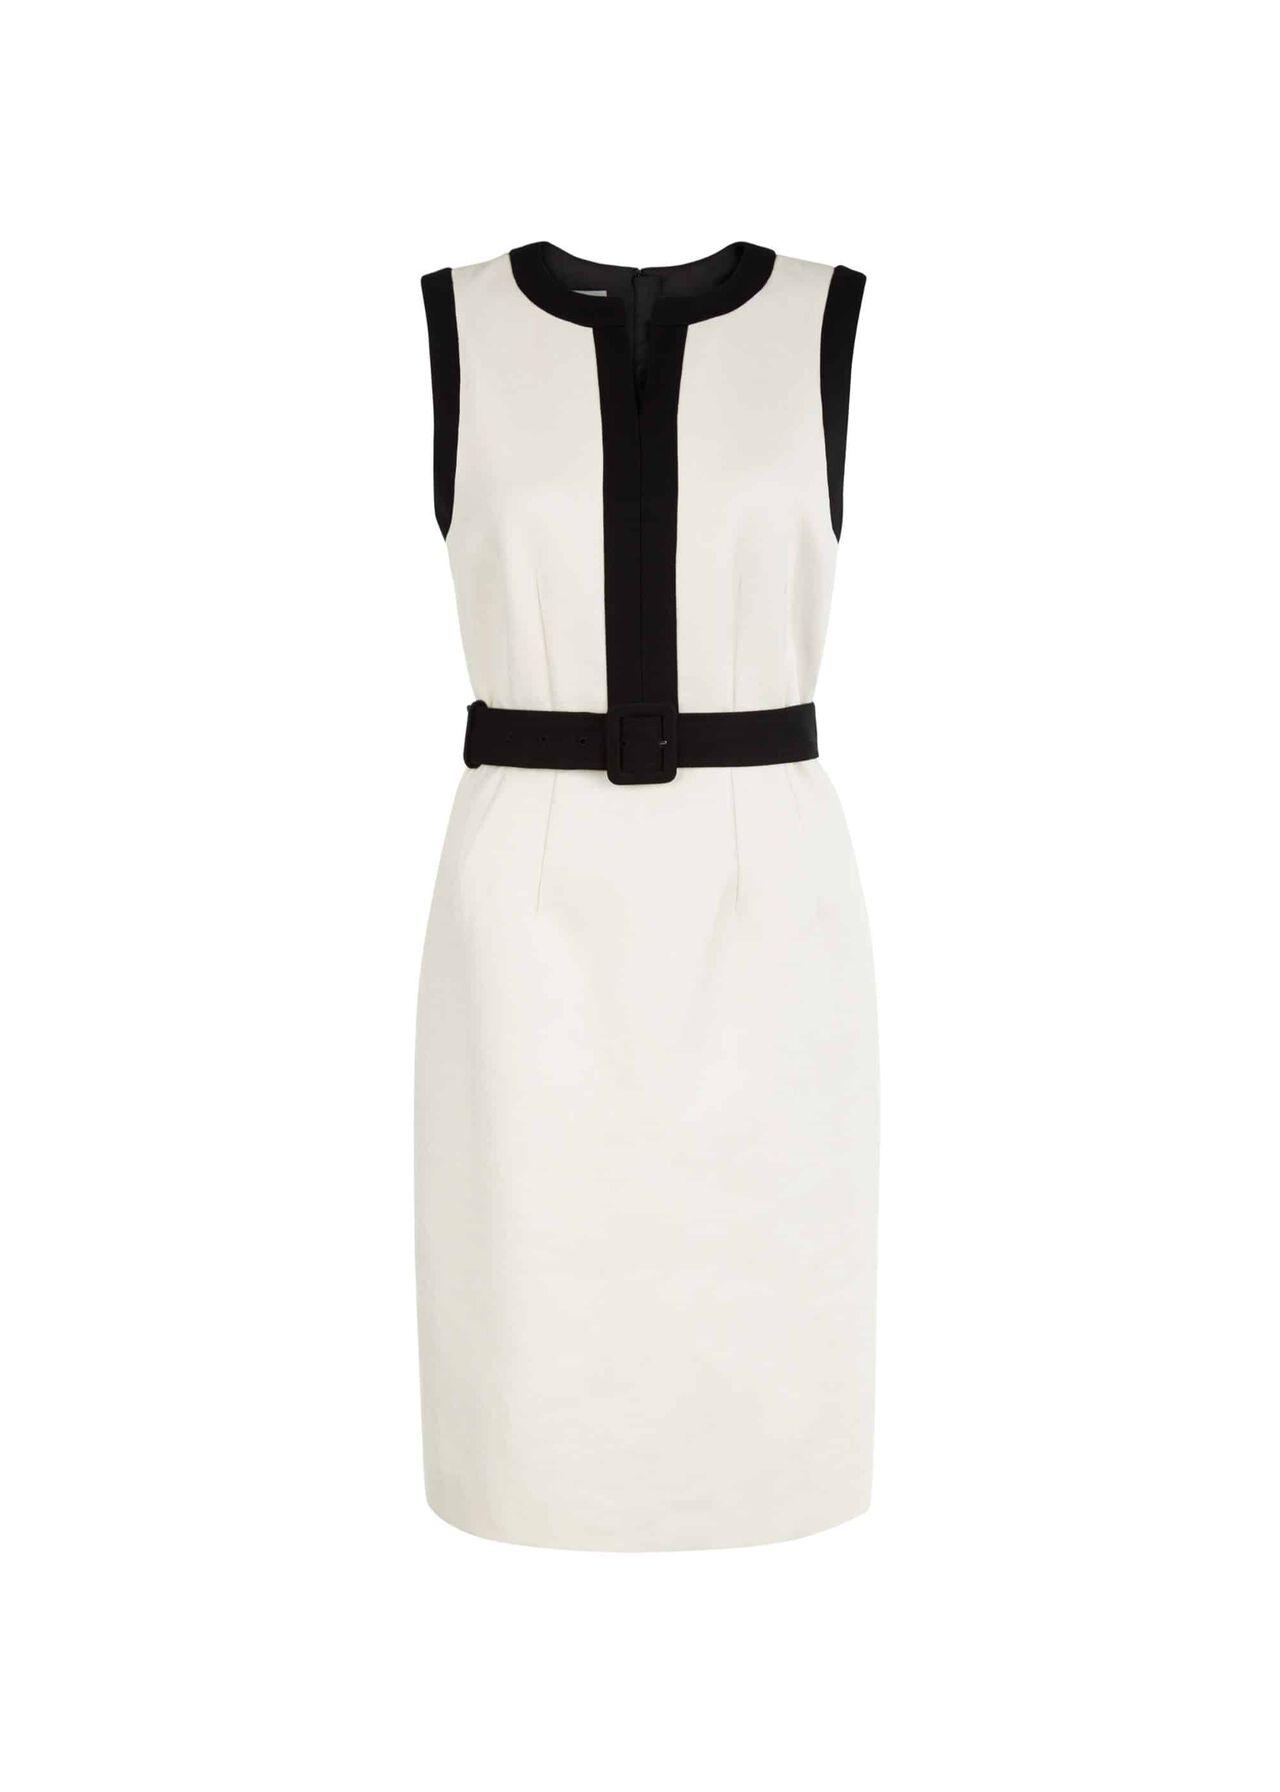 Alison Dress Neutral Black